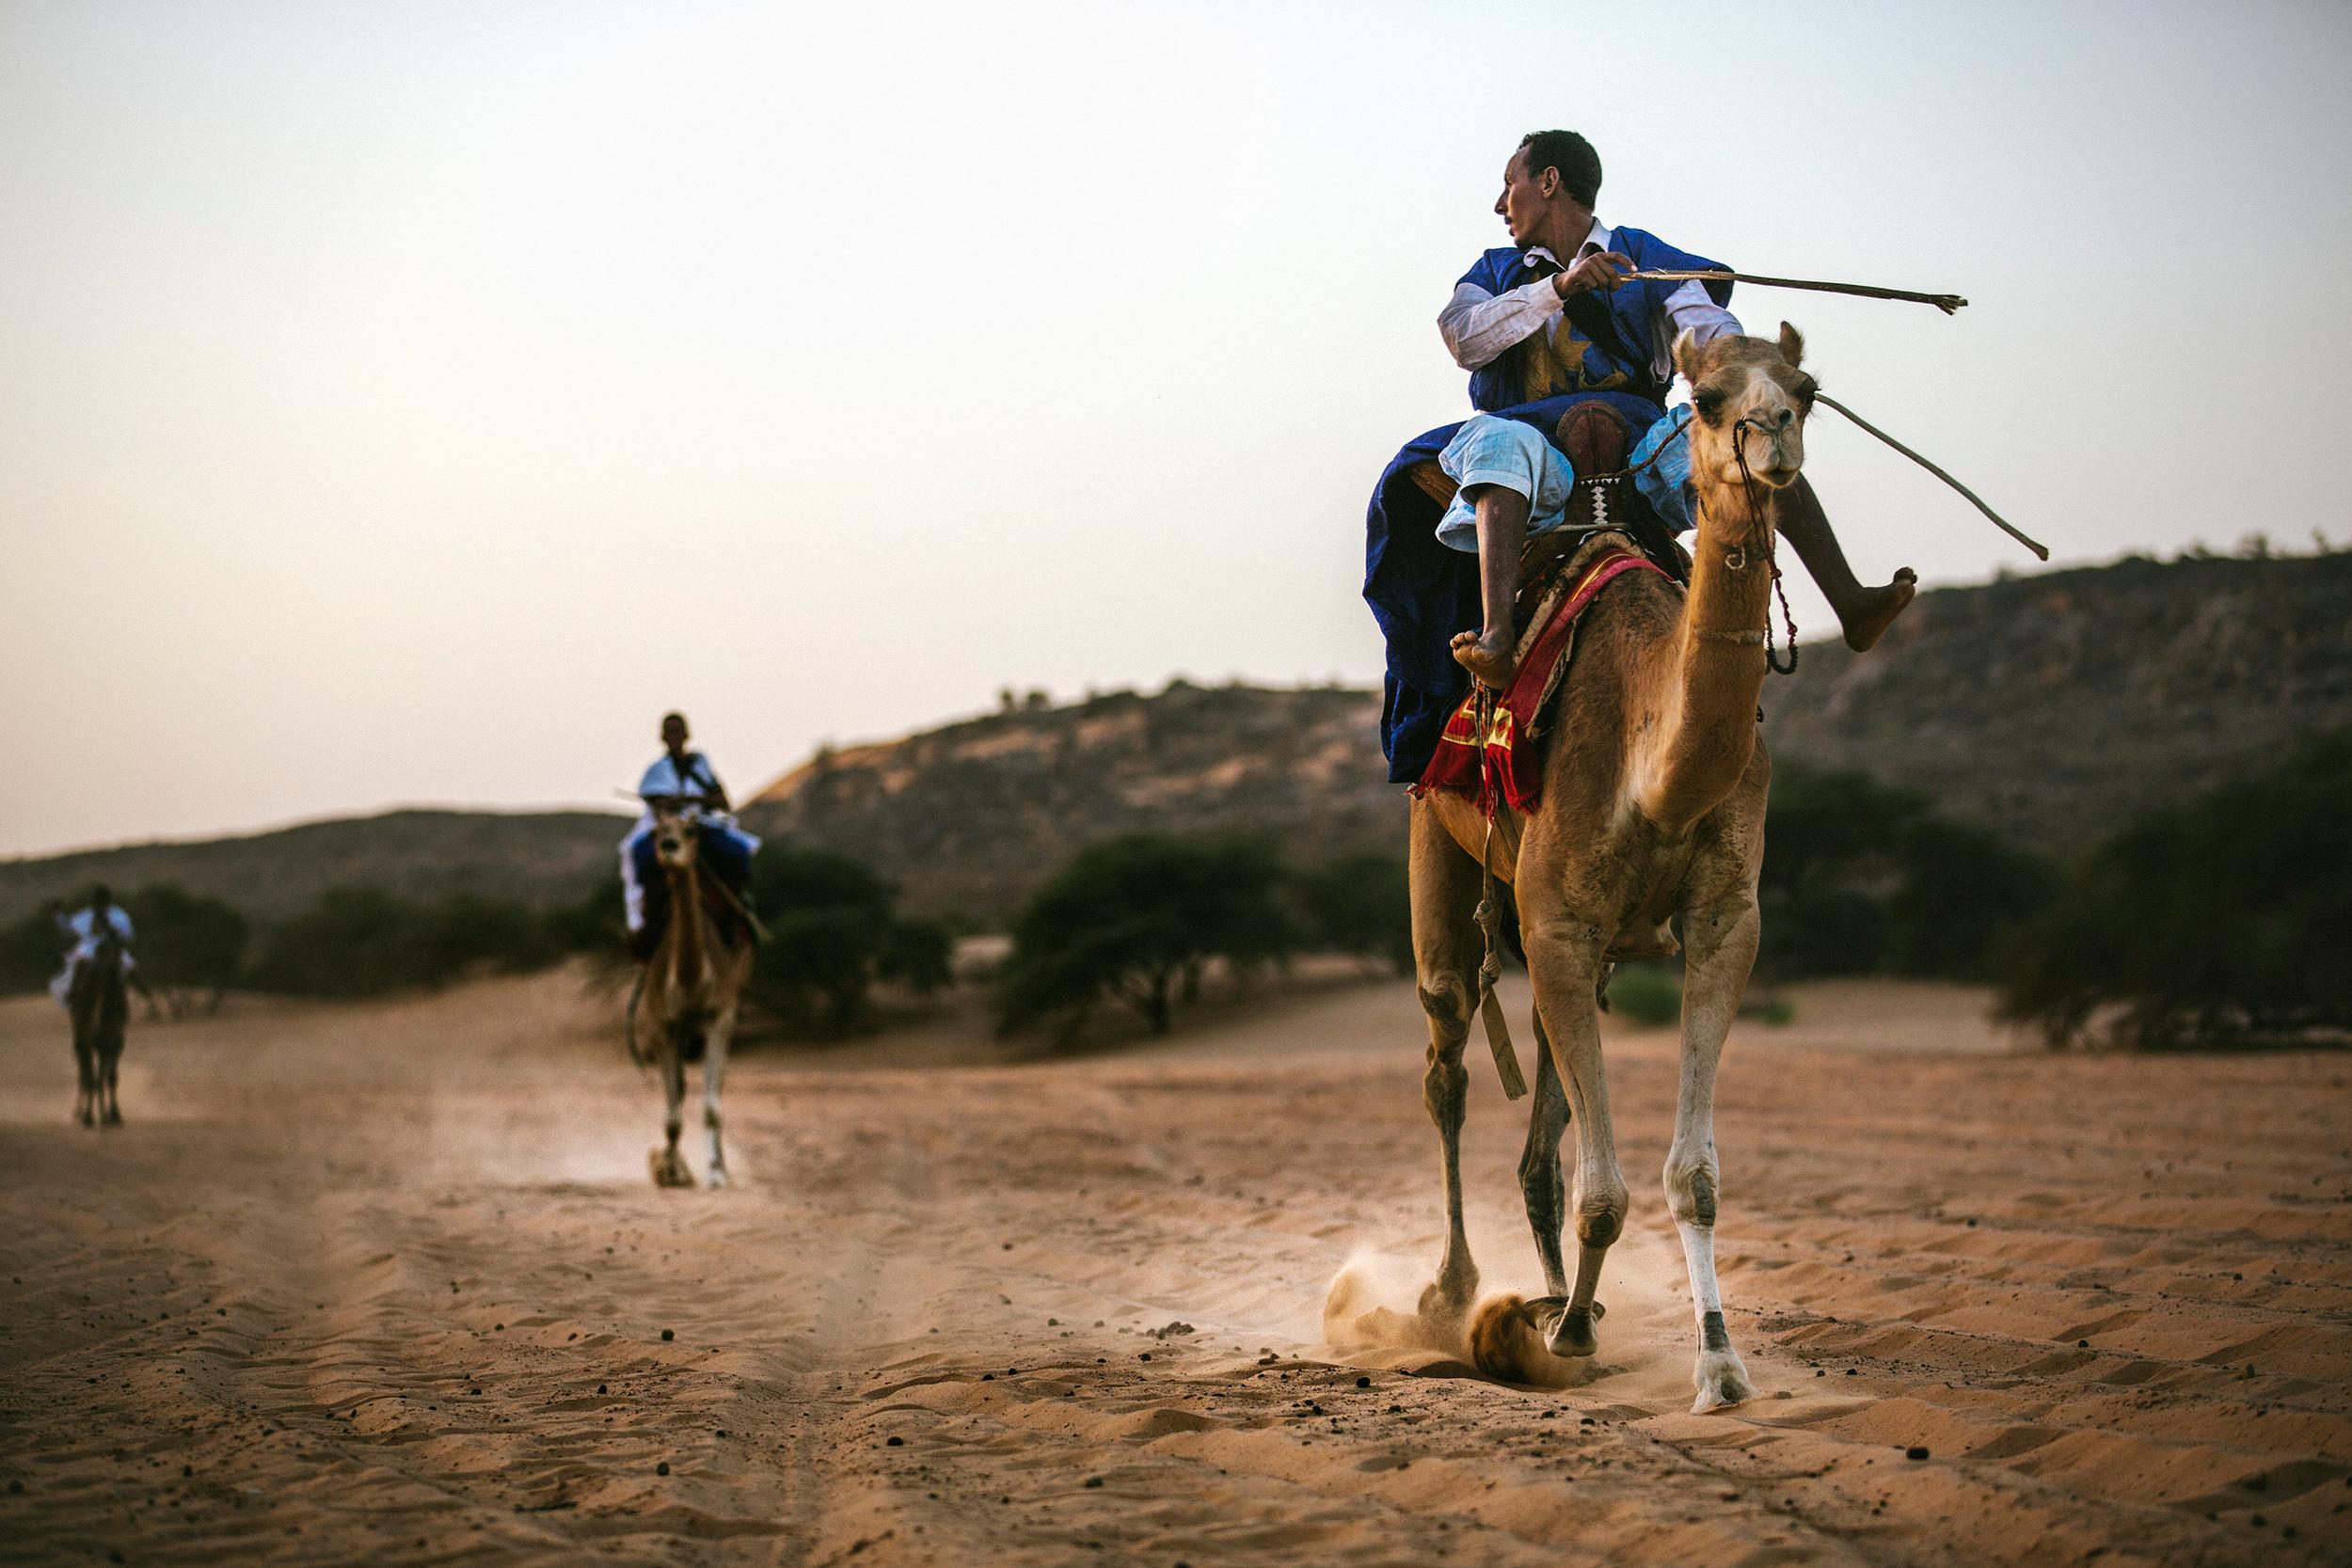 Camel racer turning around